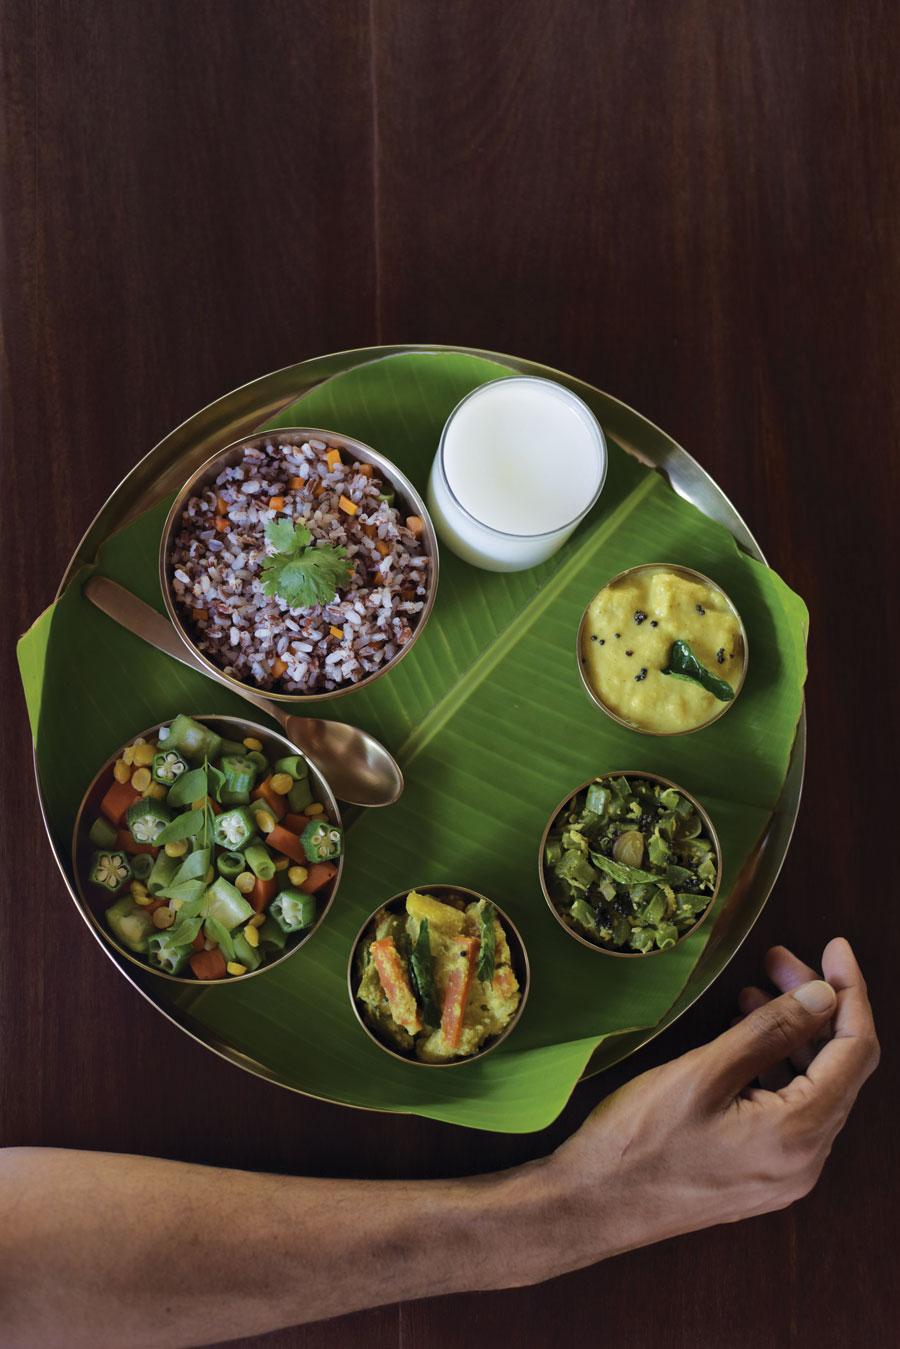 Ayurveda-Ayurveda-Indian-medicine-Kalari-Kovilakom-Kalari Rasayana Vana-The-Farm-at-San-Benito-Badrutt's-Palace-Hotel-Martha-Wiedemann